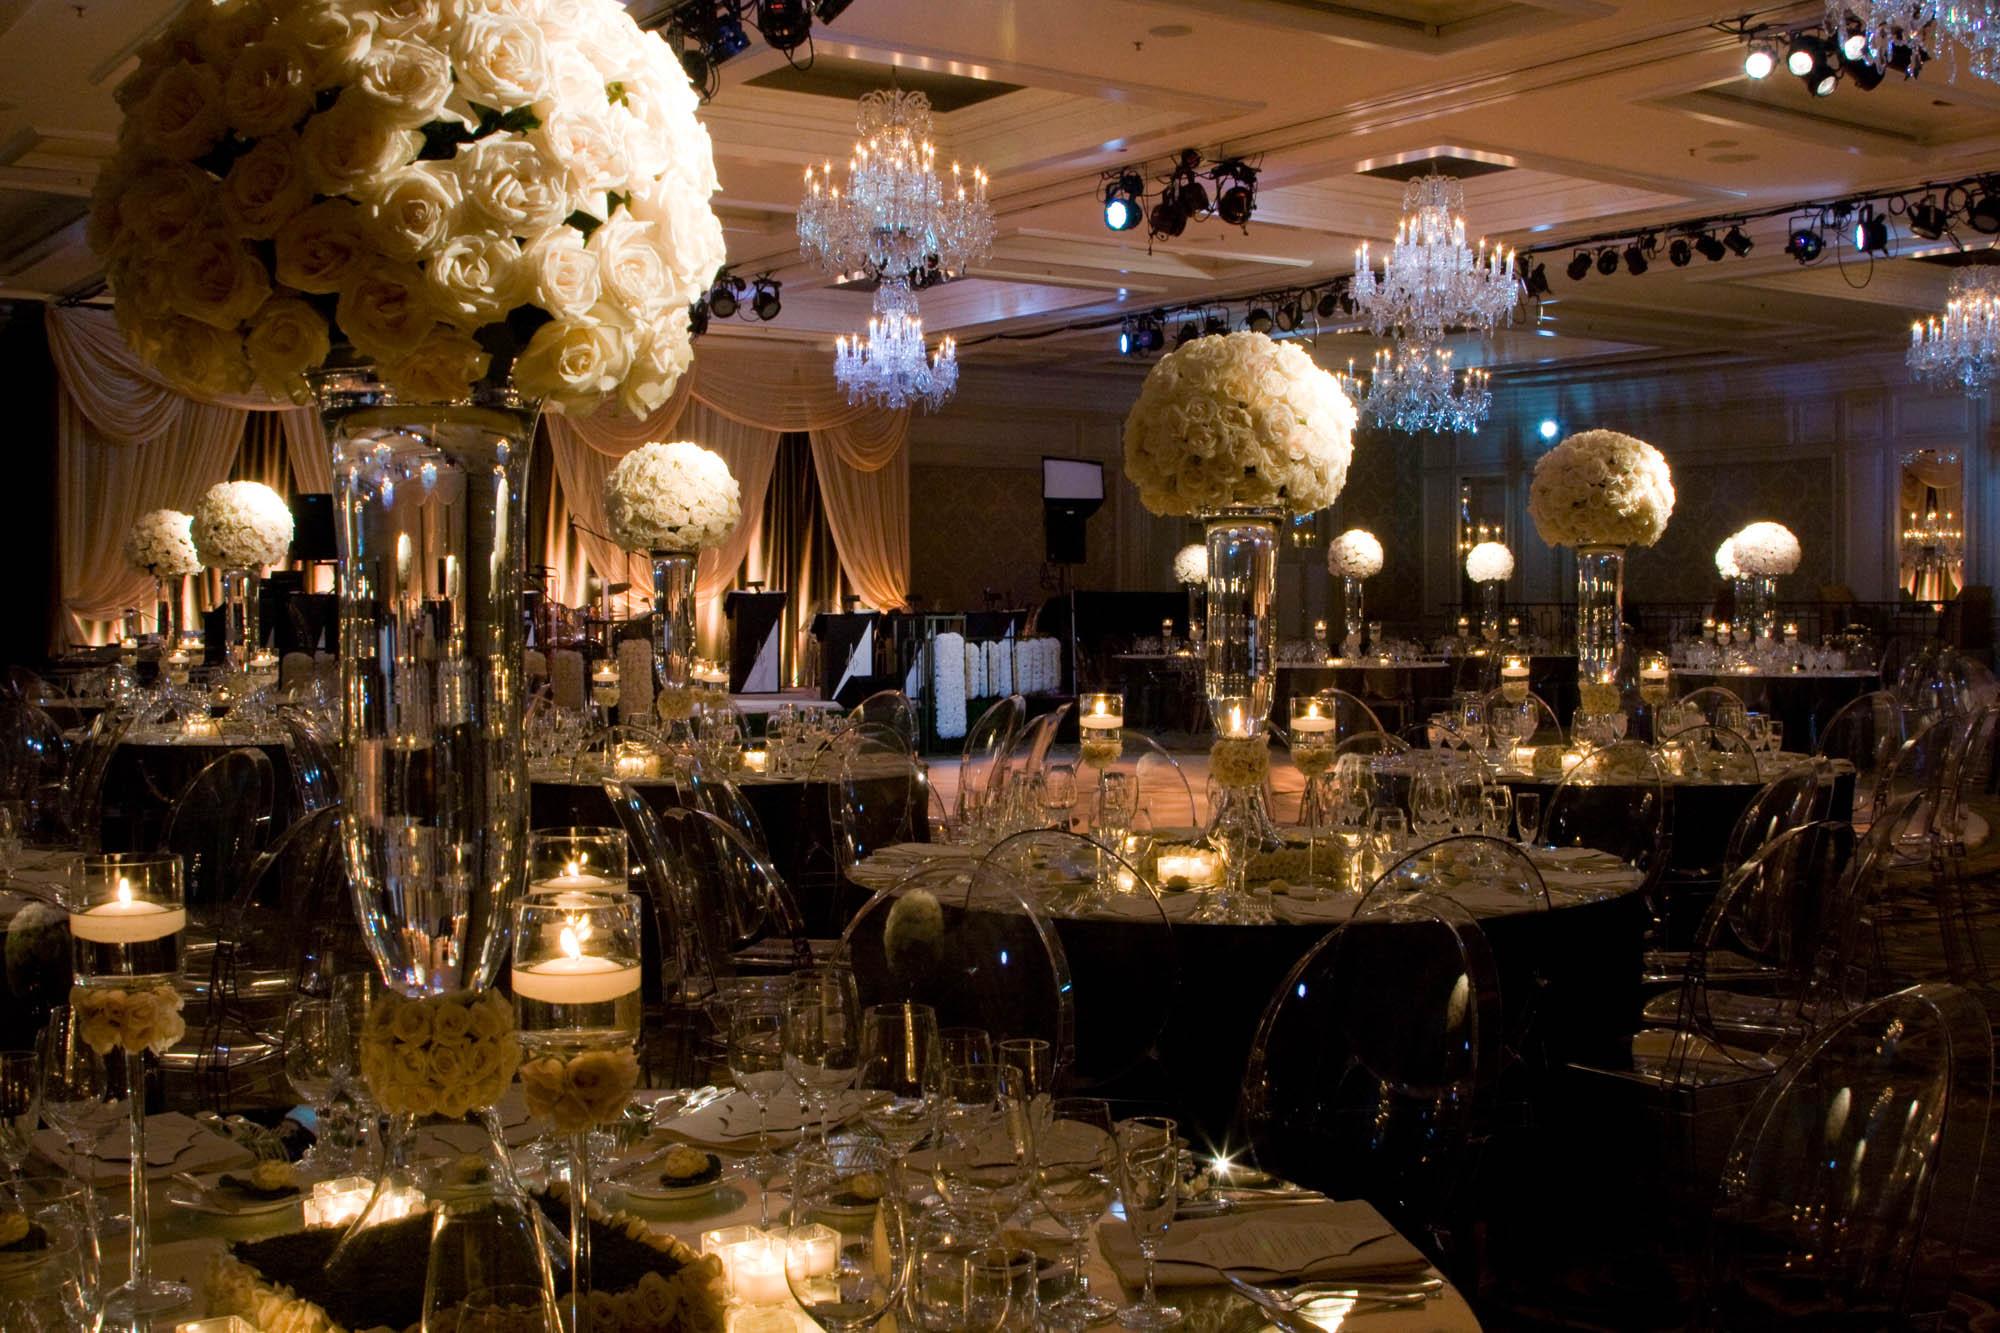 birch-bespoke-events-and-weddings-10.jpg